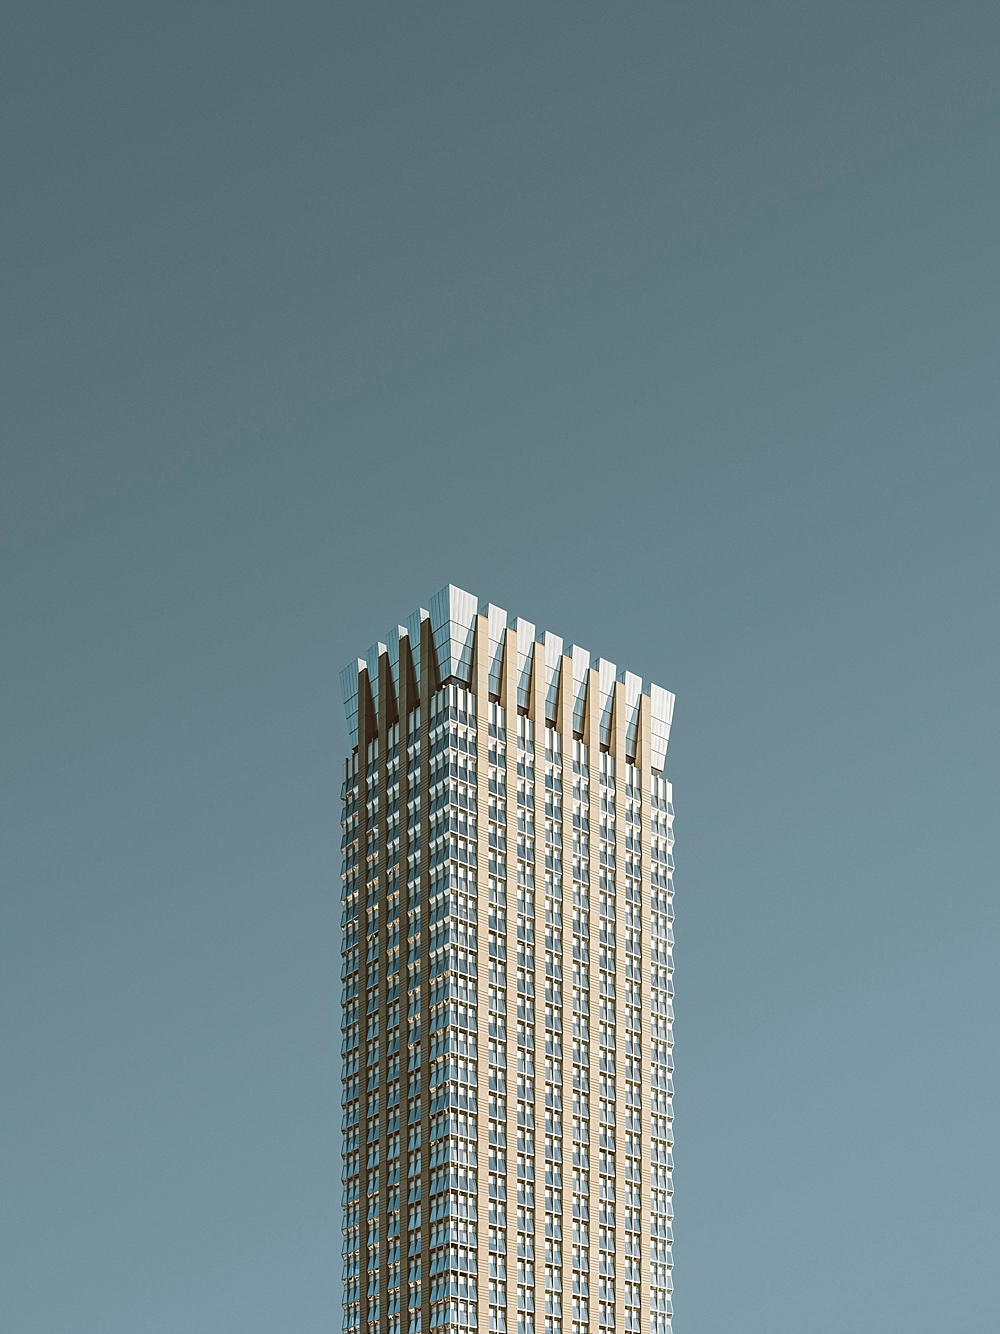 singularity_07-NewYork